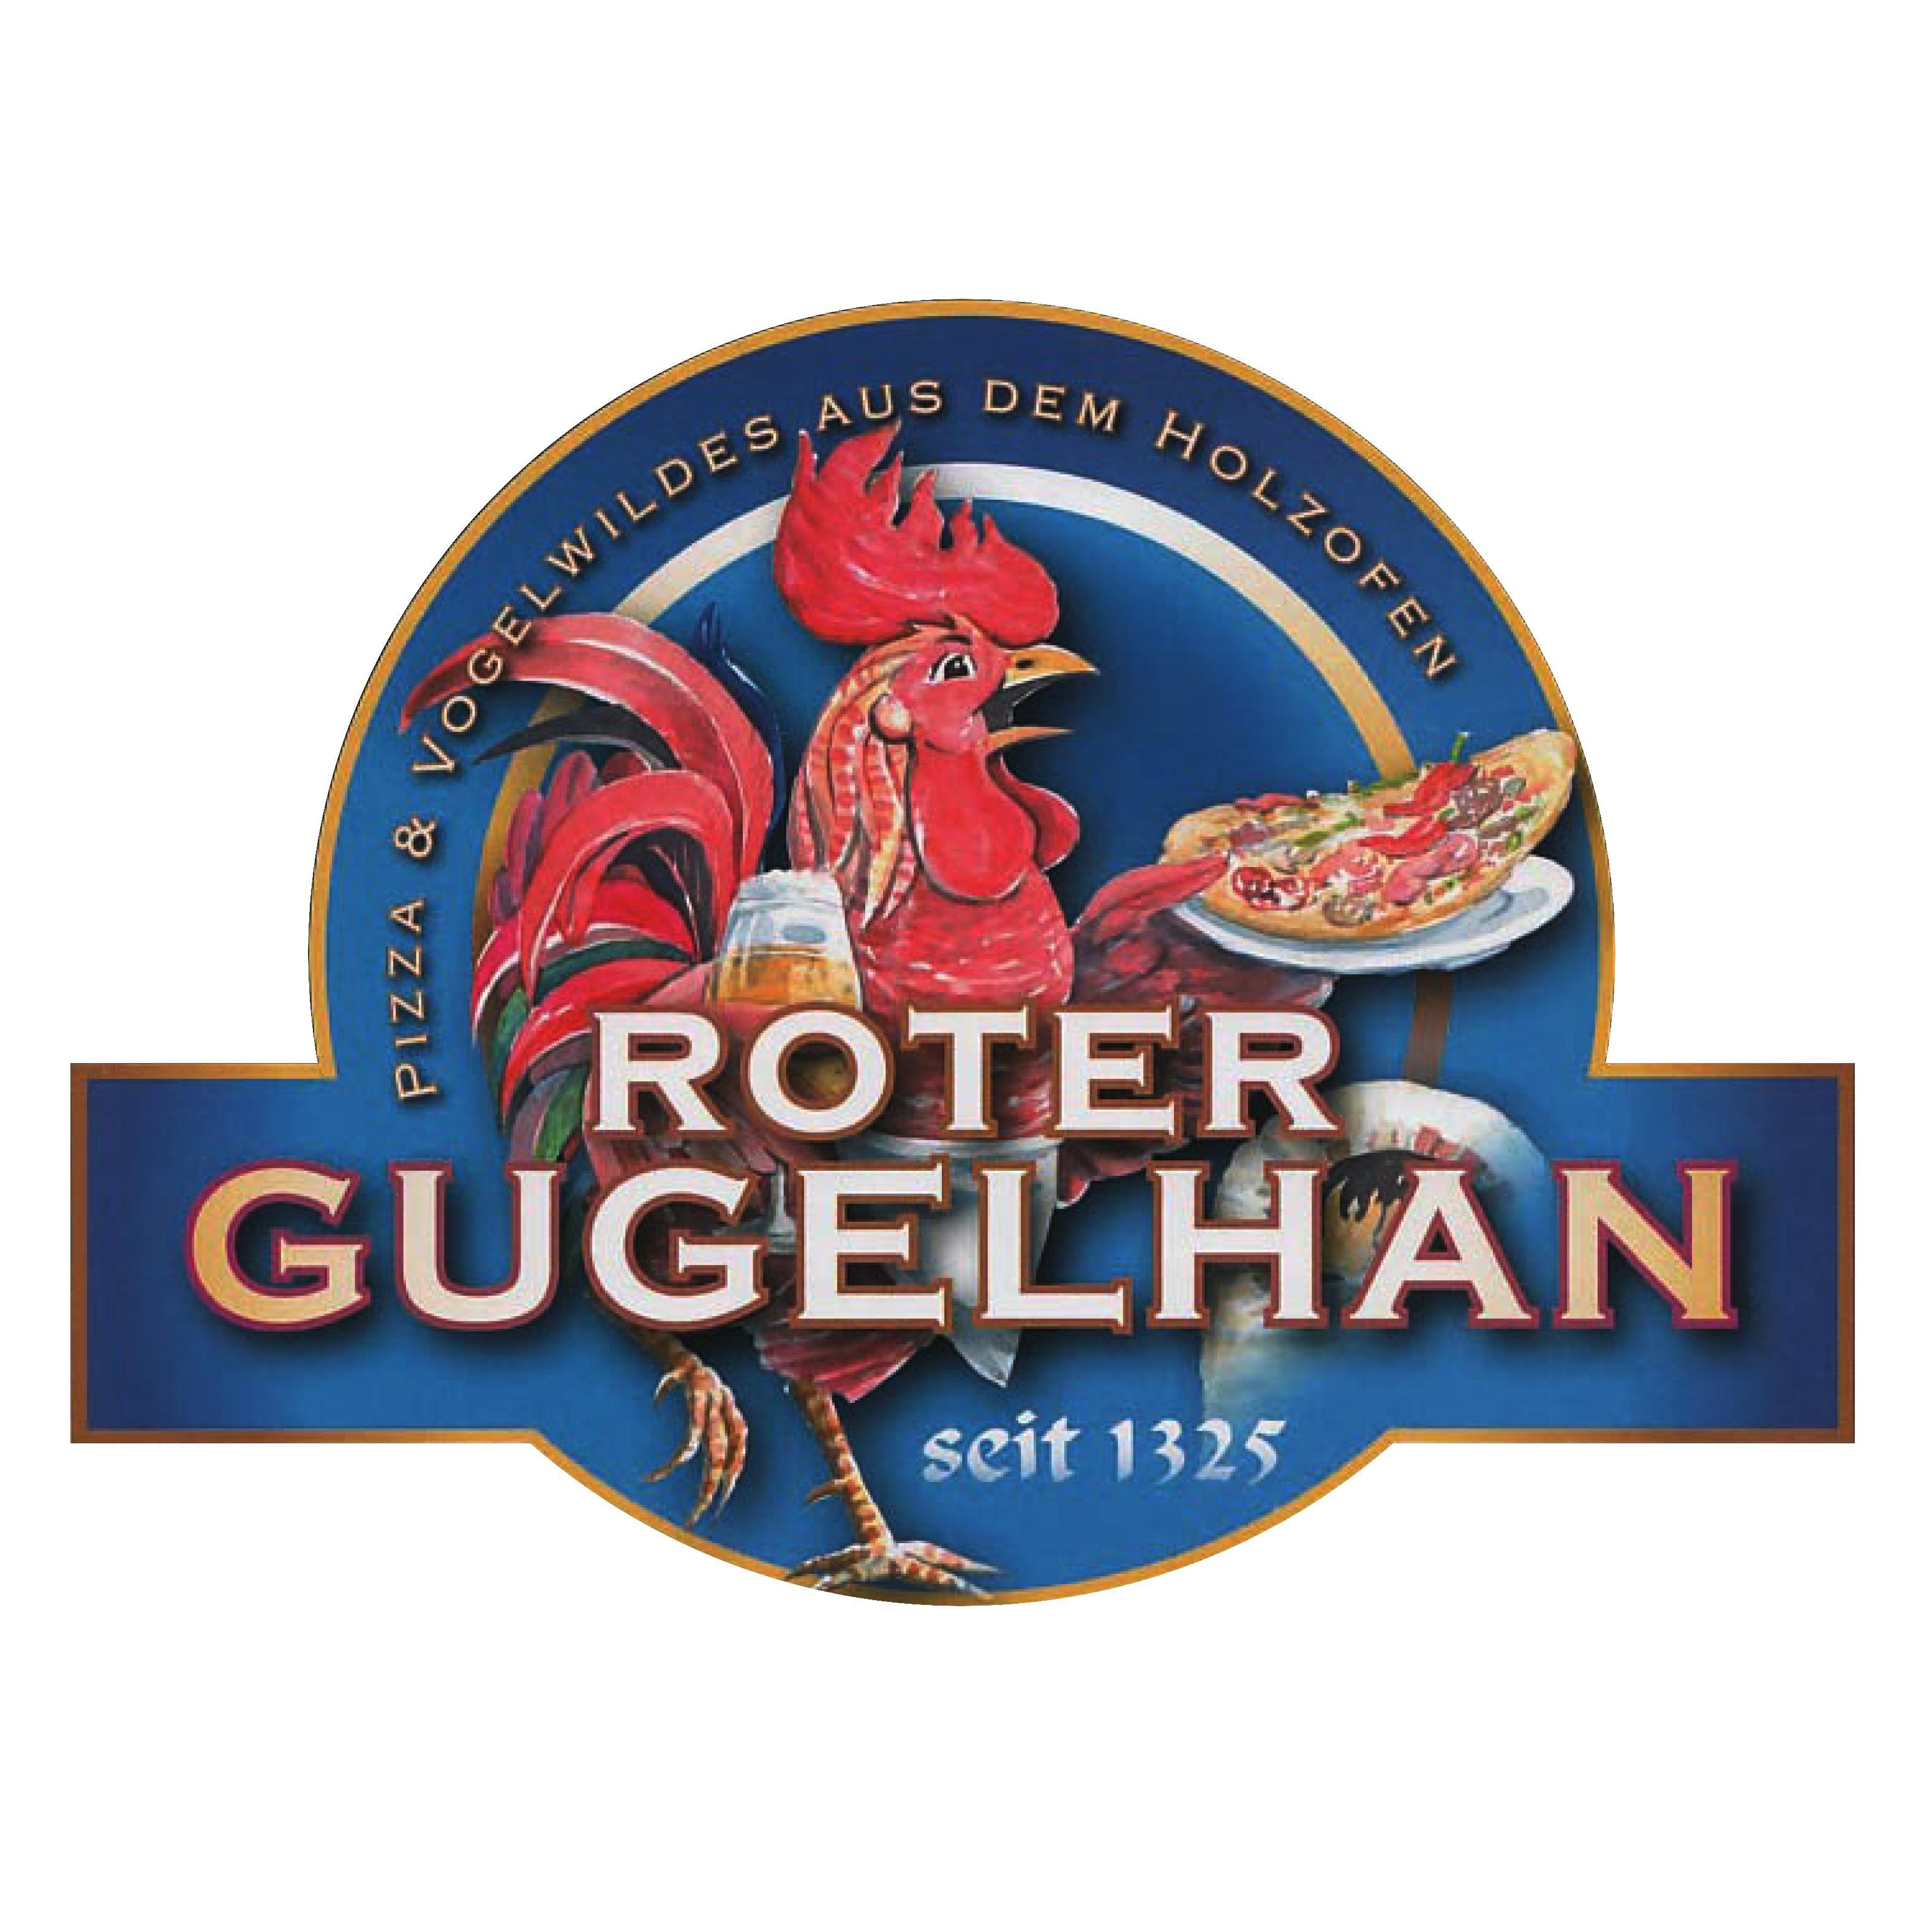 Restaurant Roter Gugelhan, das urig-rustikalen Restaurant in der Konstanzer Altstadt.